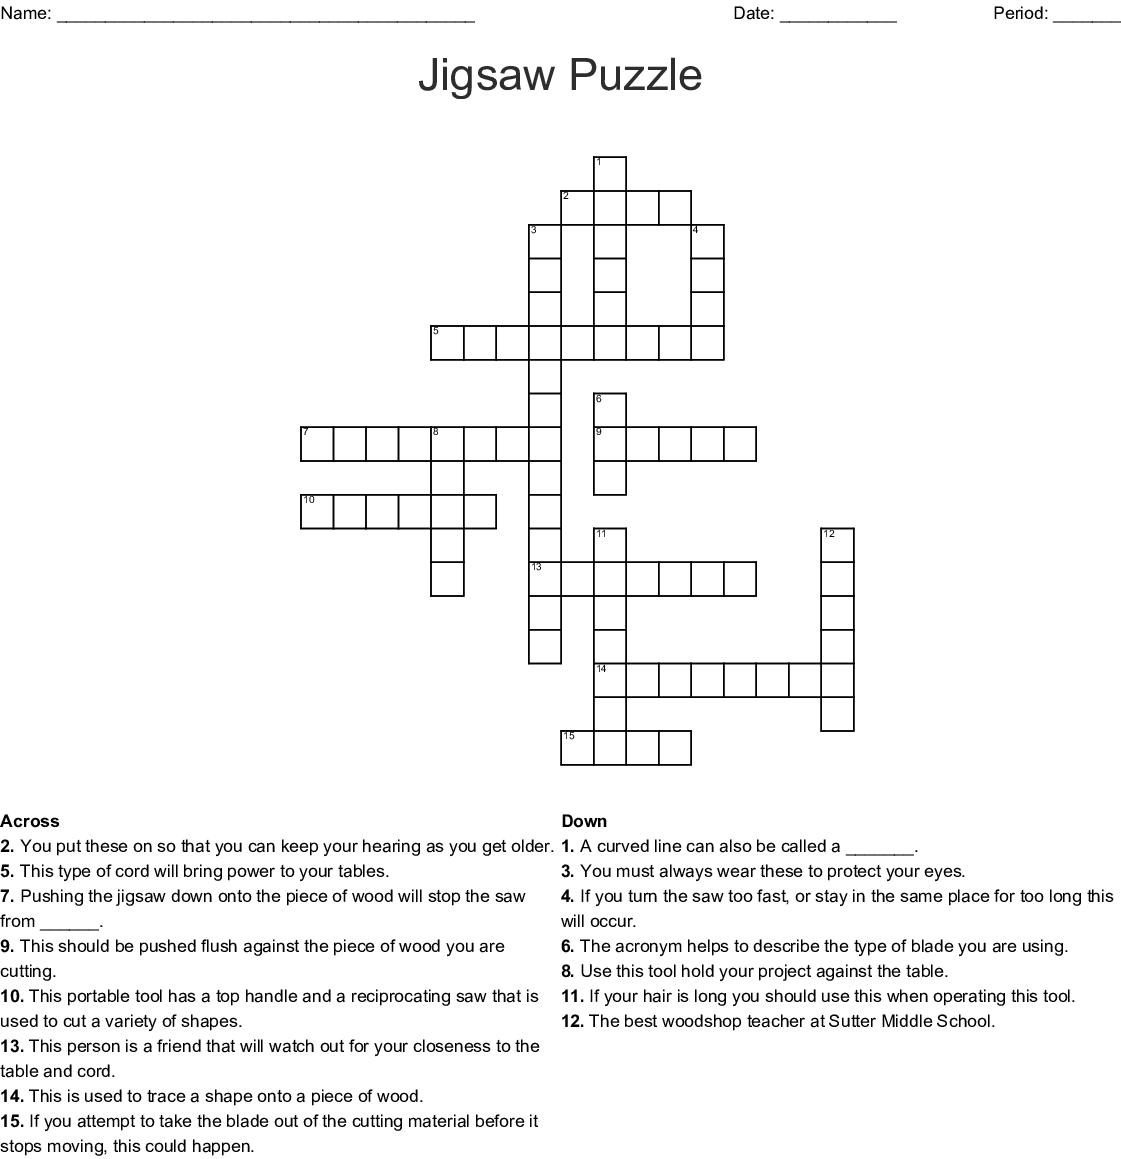 Jigsaw Puzzle Crossword